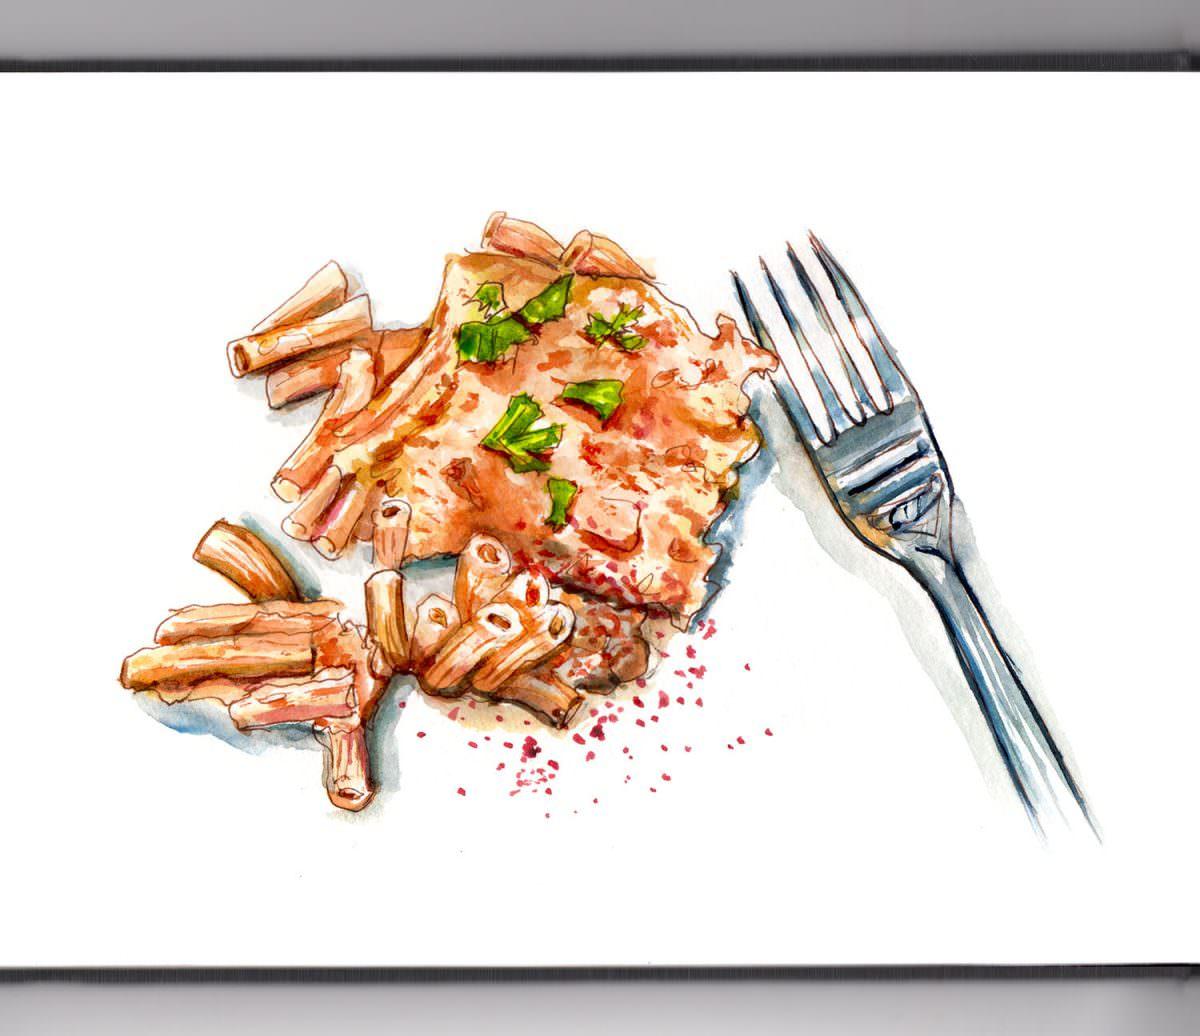 #WorldWatercolorGroup - Cozy Mac & Cheese - Doodlewash